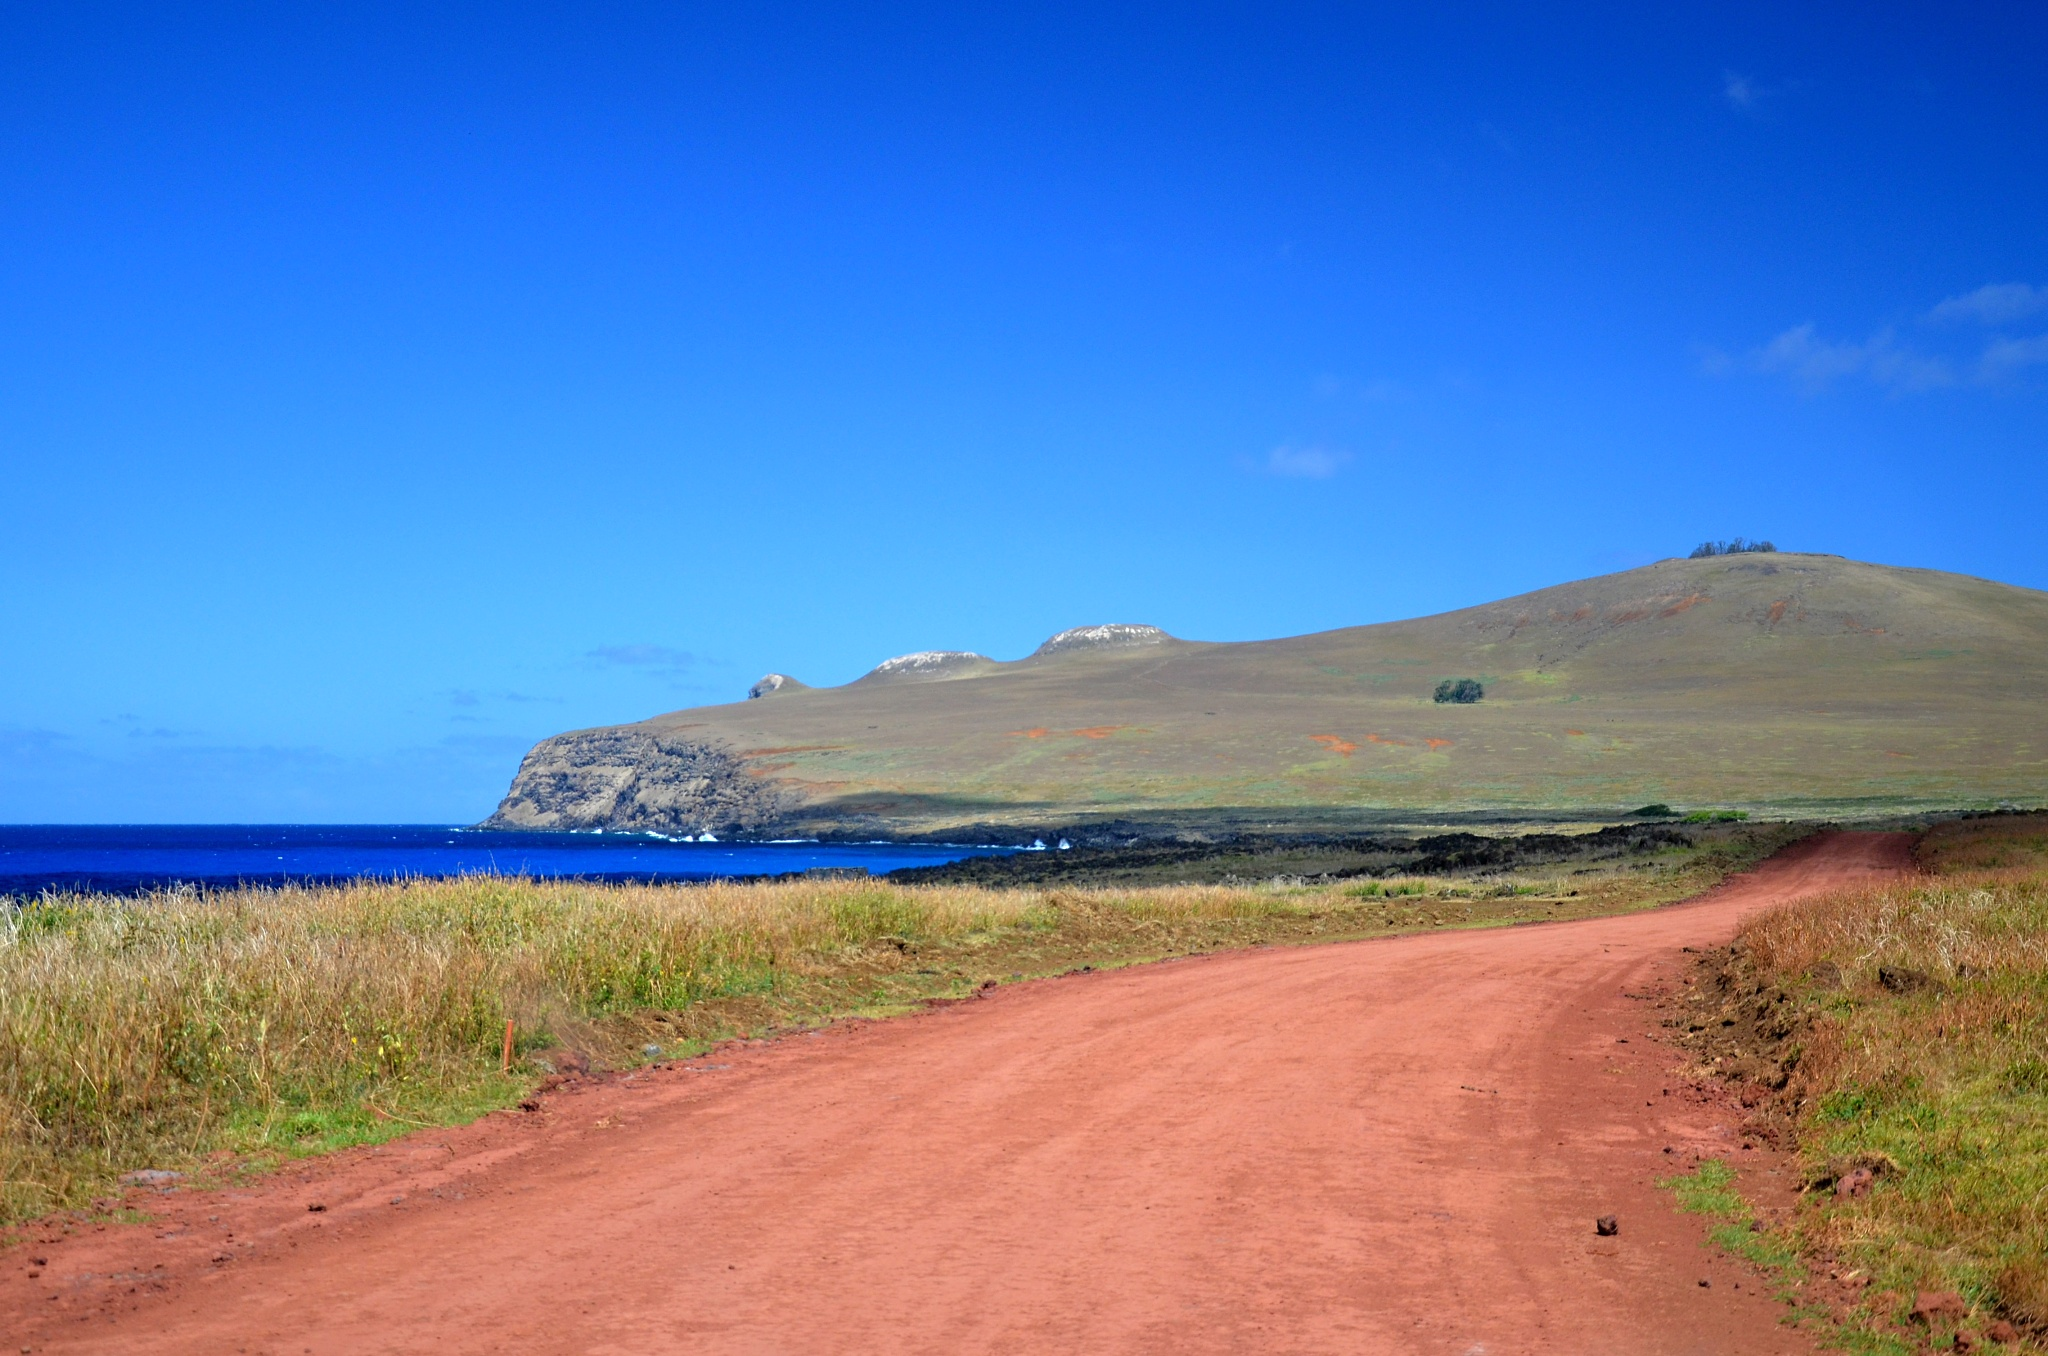 Vulkán Puakatike